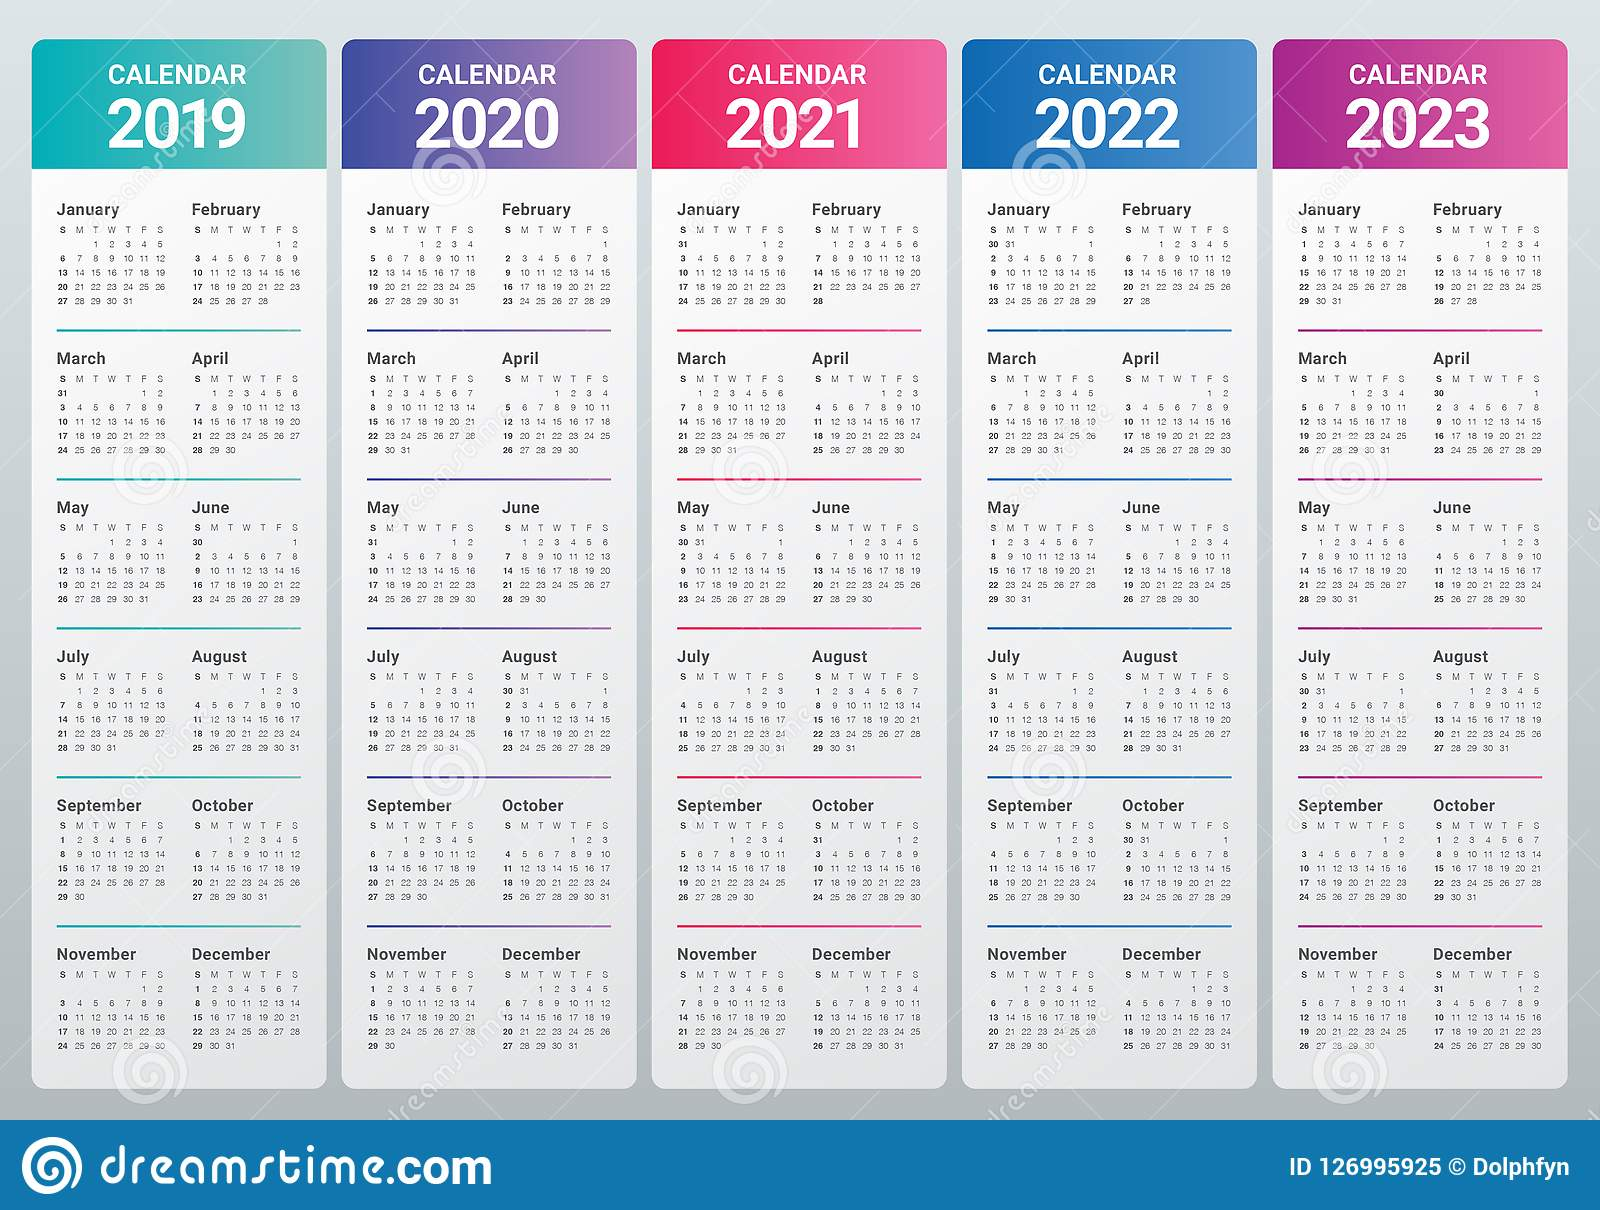 Calendar Template 2022 2023.Year 2019 2020 2021 2022 2023 Calendar Vector Design Template Stock Vector Illustration Of Calendar Date 126995925